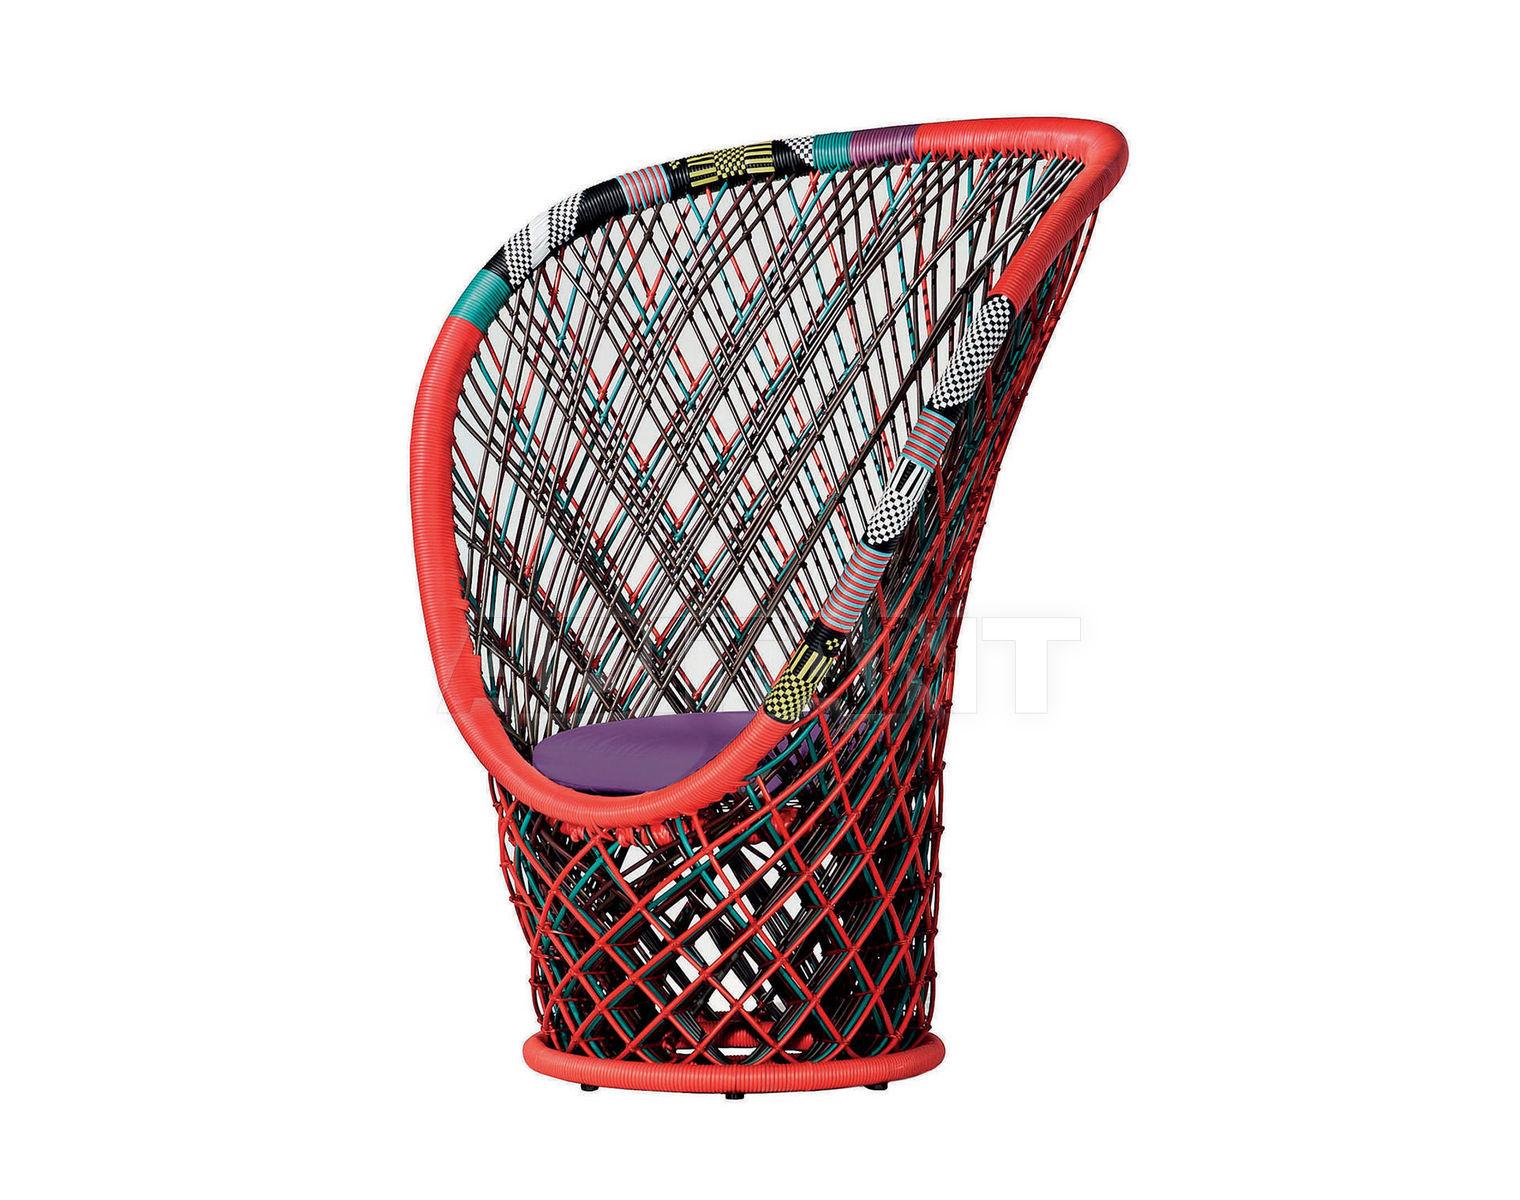 Купить Кресло для террасы  PAVO REAL Driade L`arte Di Abitare 9820192